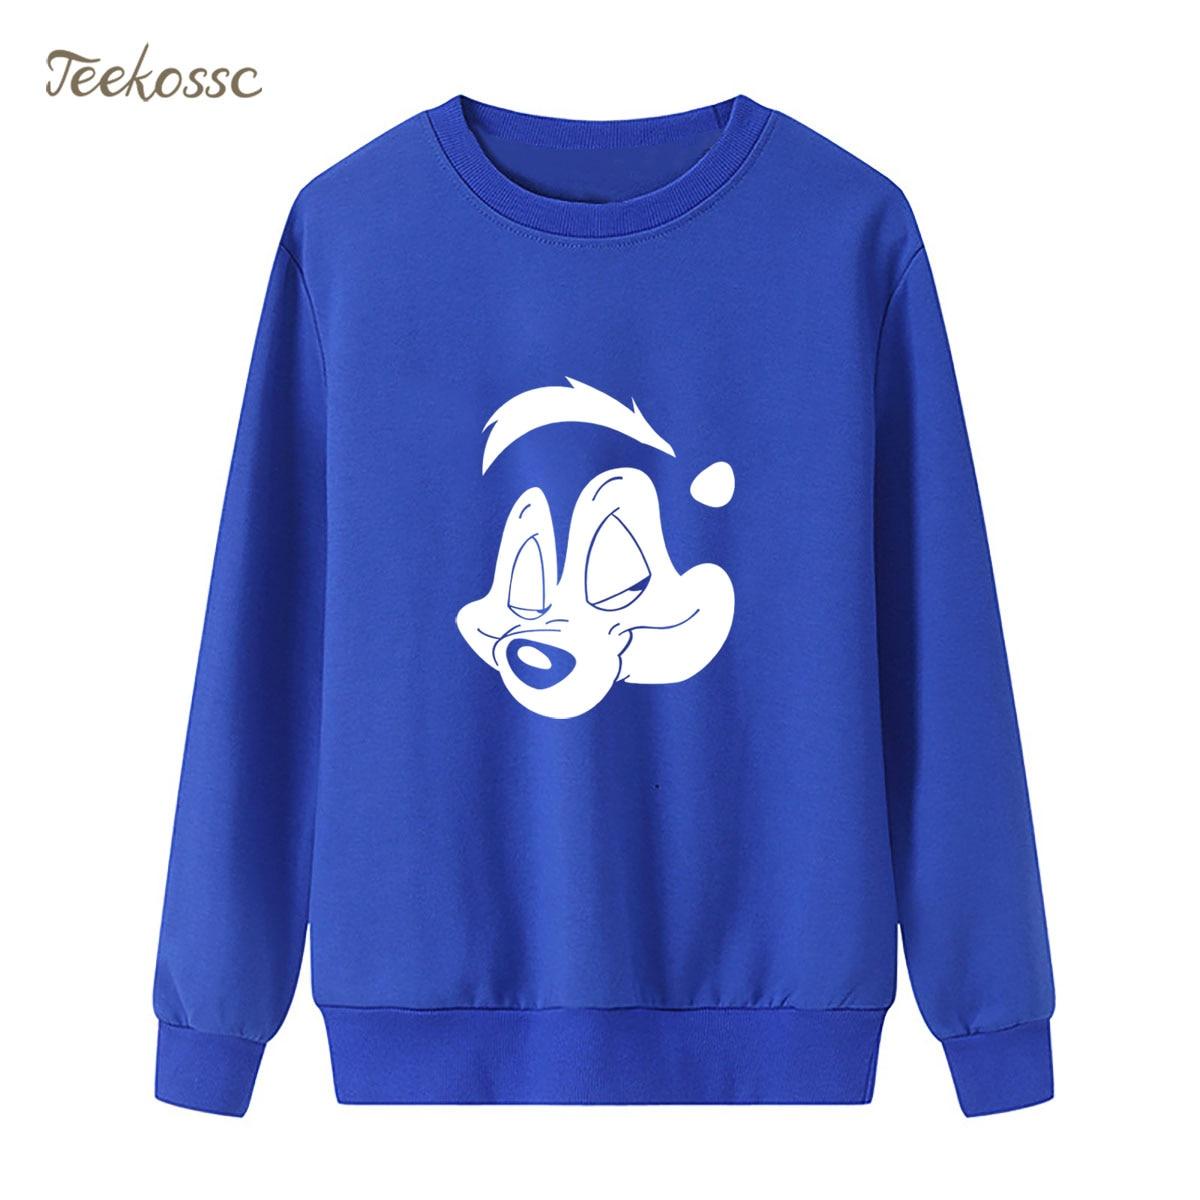 Anime Pepe Le Pew Sweatshirt Funny Print Hoodie 2018 New Brand Winter Autumn Women Lasdies Pullover Fleece Warm Loose Streetwear